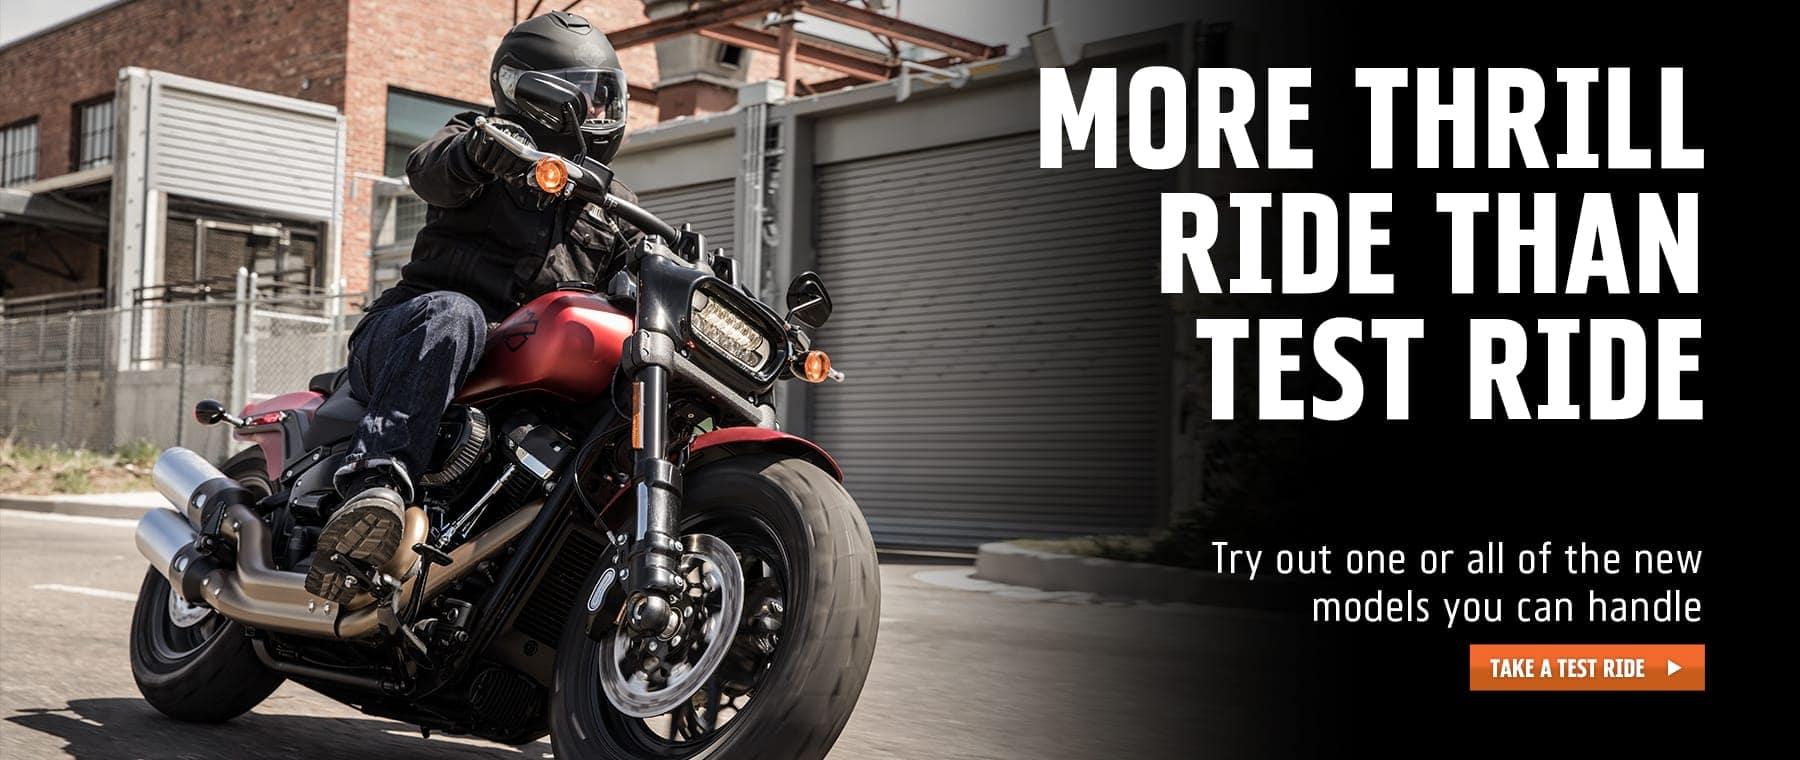 Bert's Barracuda Harley-Davidson | Harley-Davidson Dealer in